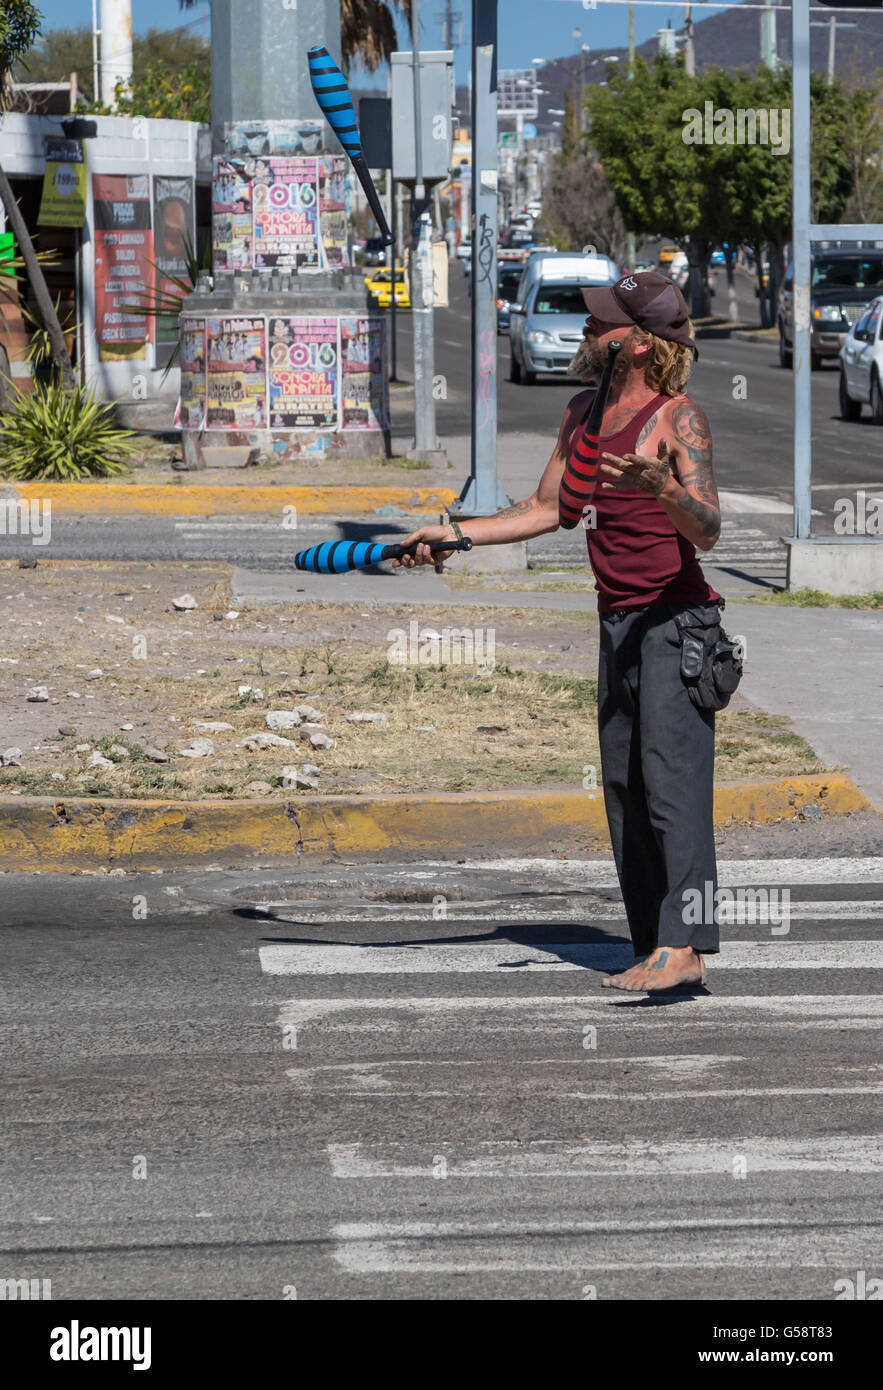 Street entertainer juggling during a stop in traffic in Santiago de Queretaro, Queretaro, Mexico - Stock Image